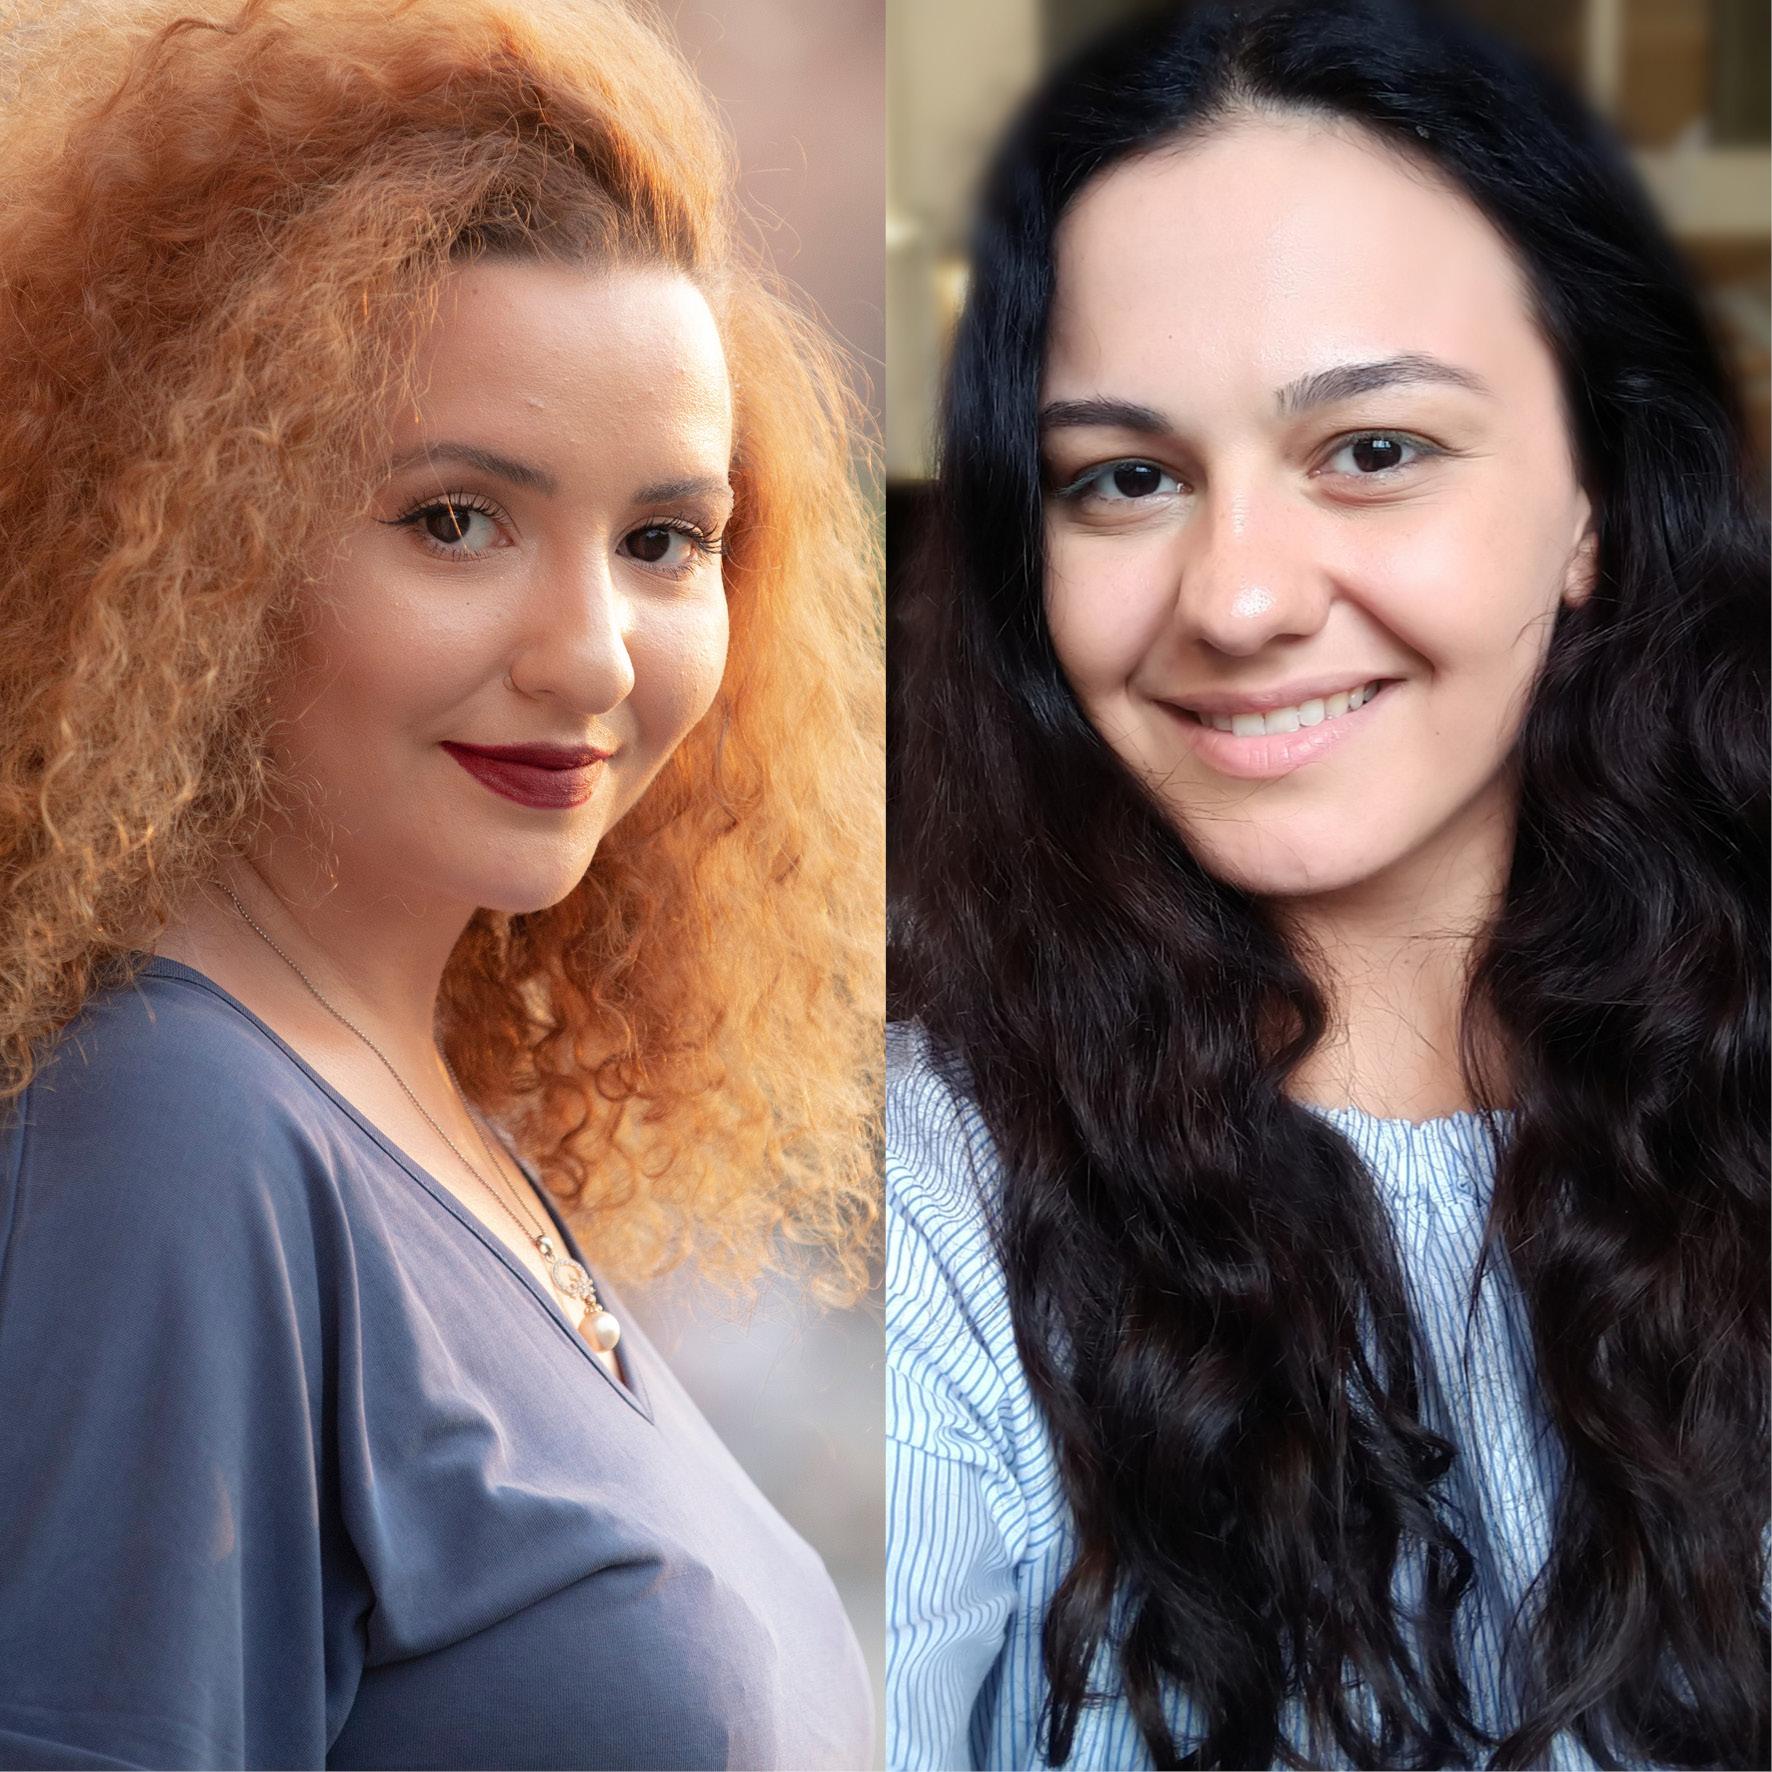 Duo 2: Anna Avdalyan / Astghik Bakhshiyan